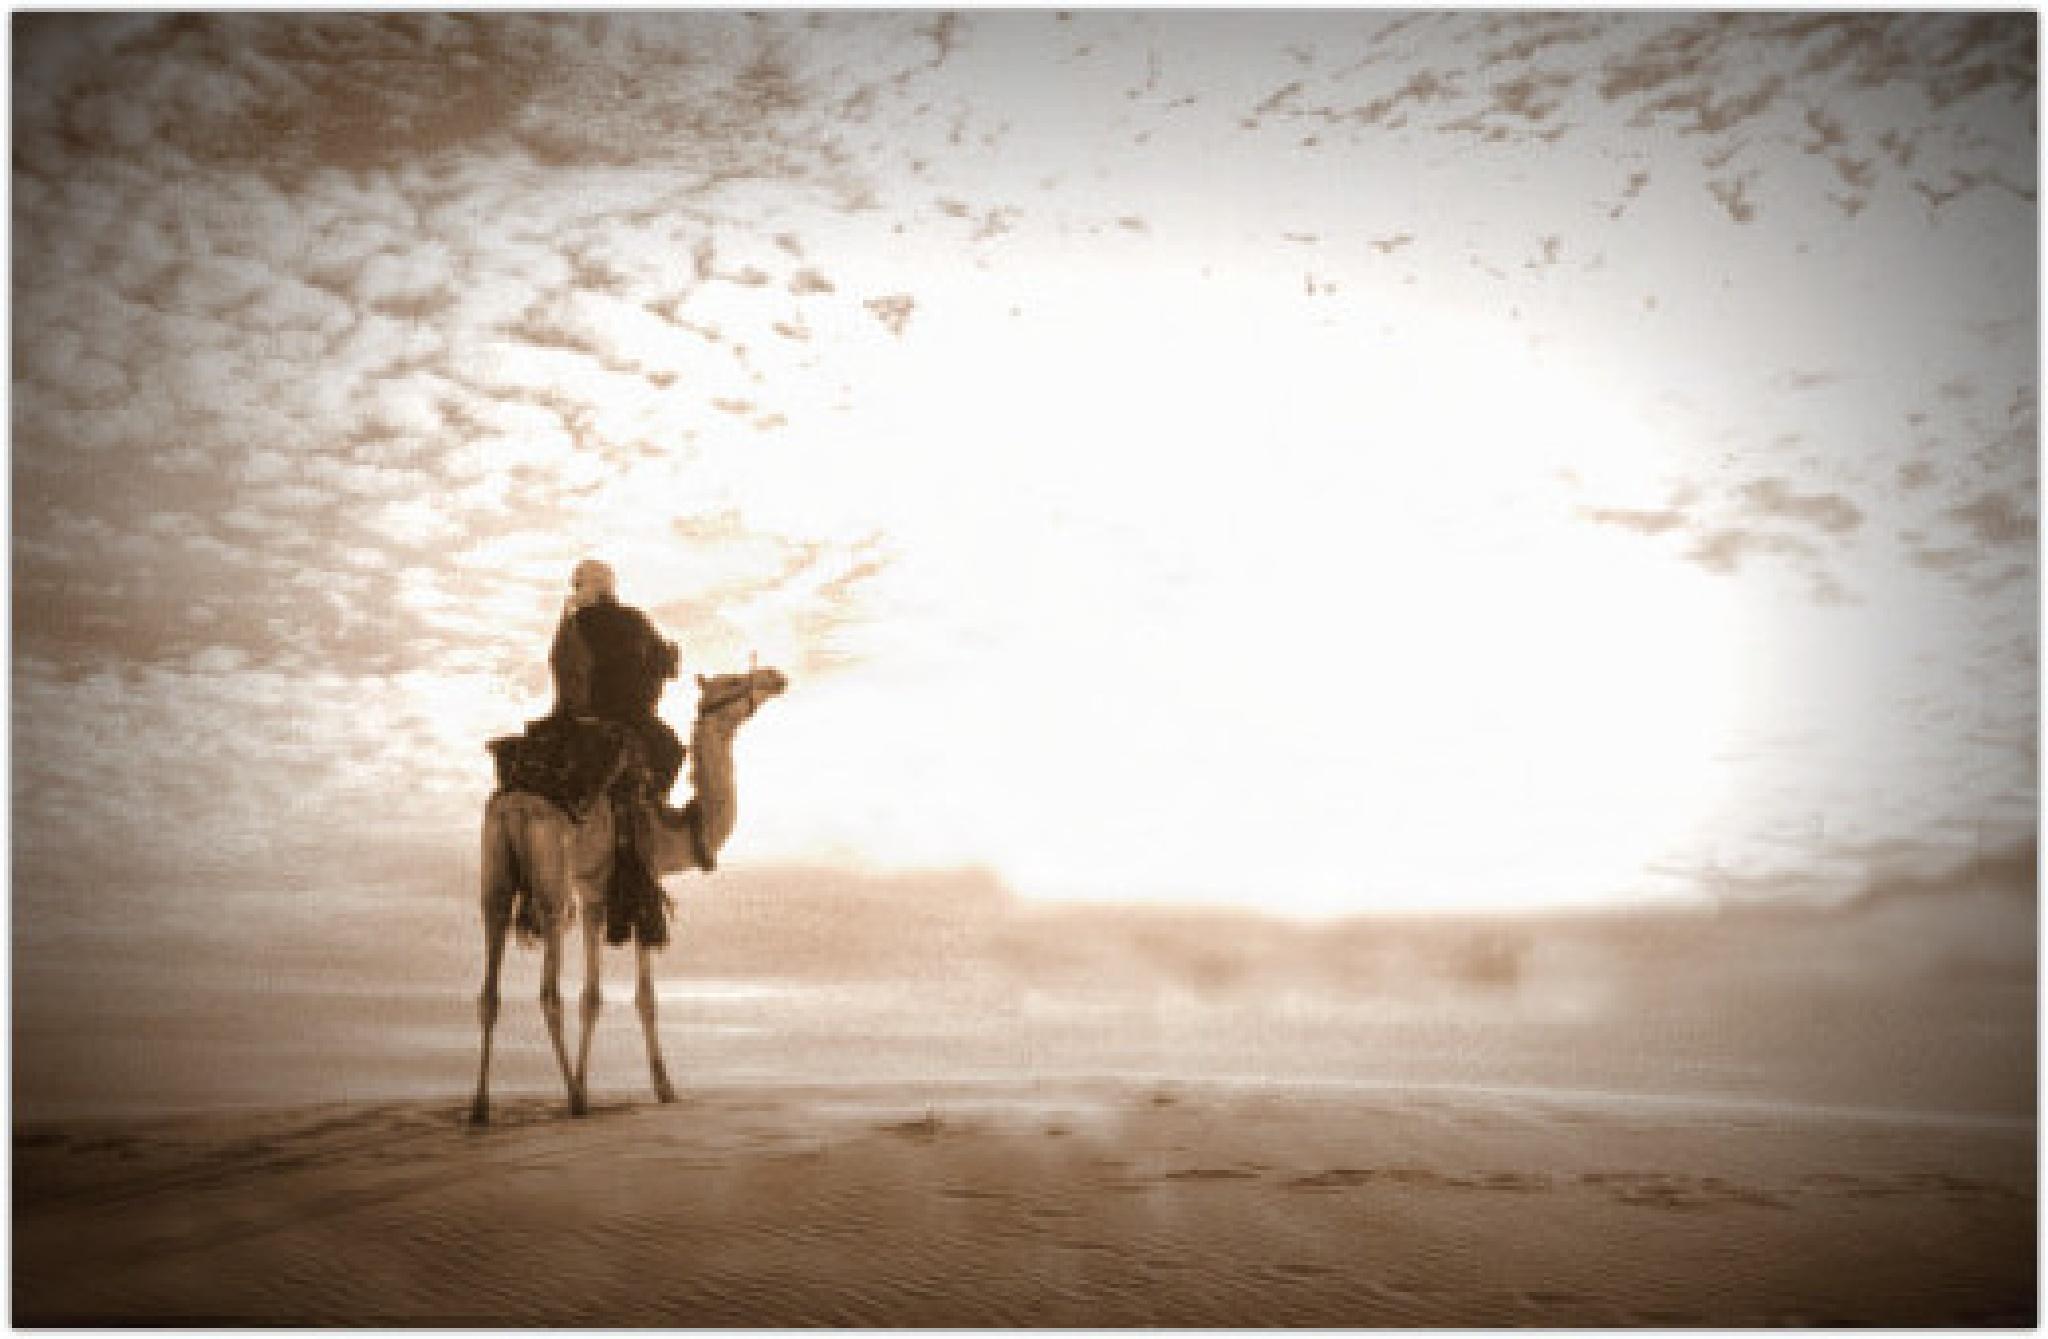 Alone in the Light. by Samir Sami